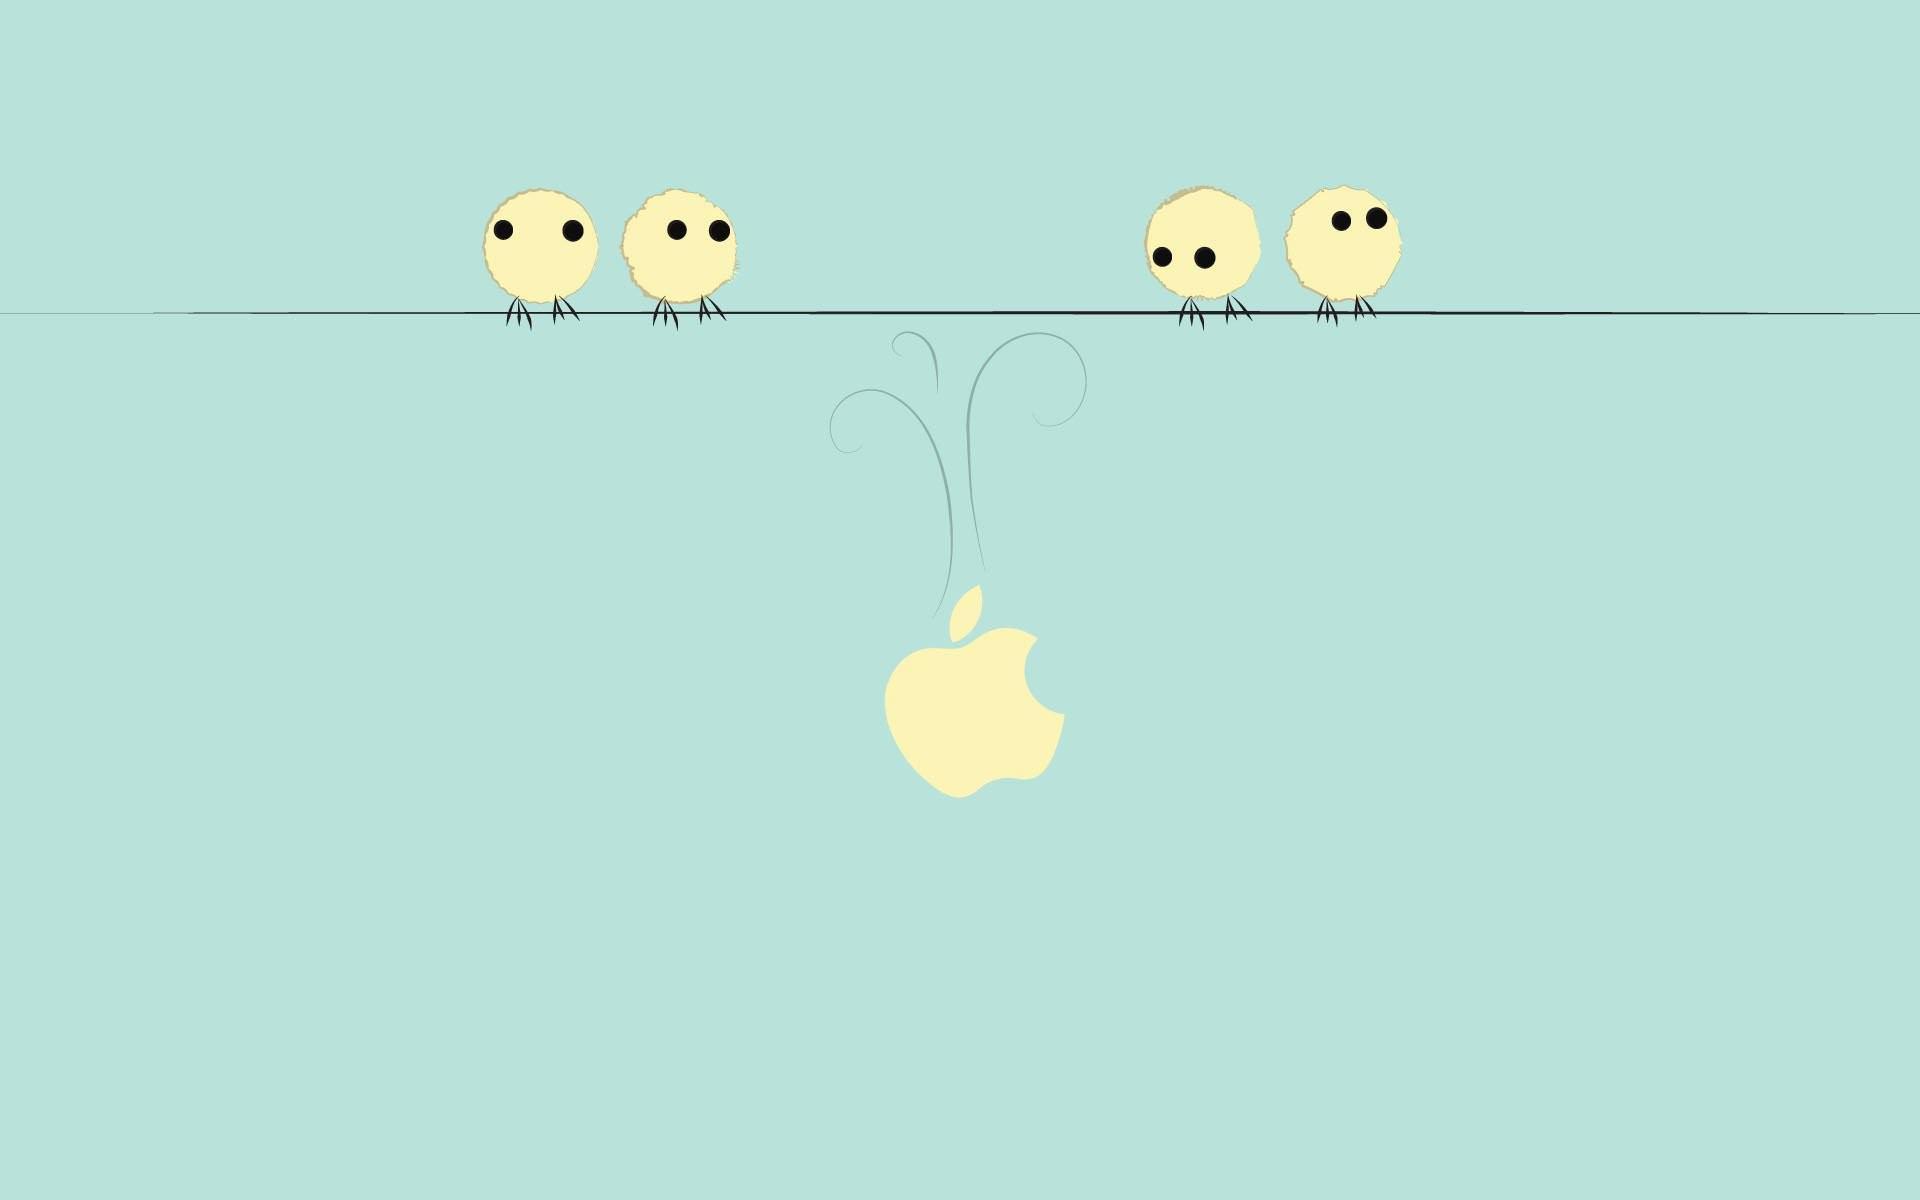 Kawaii Mac Wallpapers - Top Free Kawaii Mac Backgrounds ...